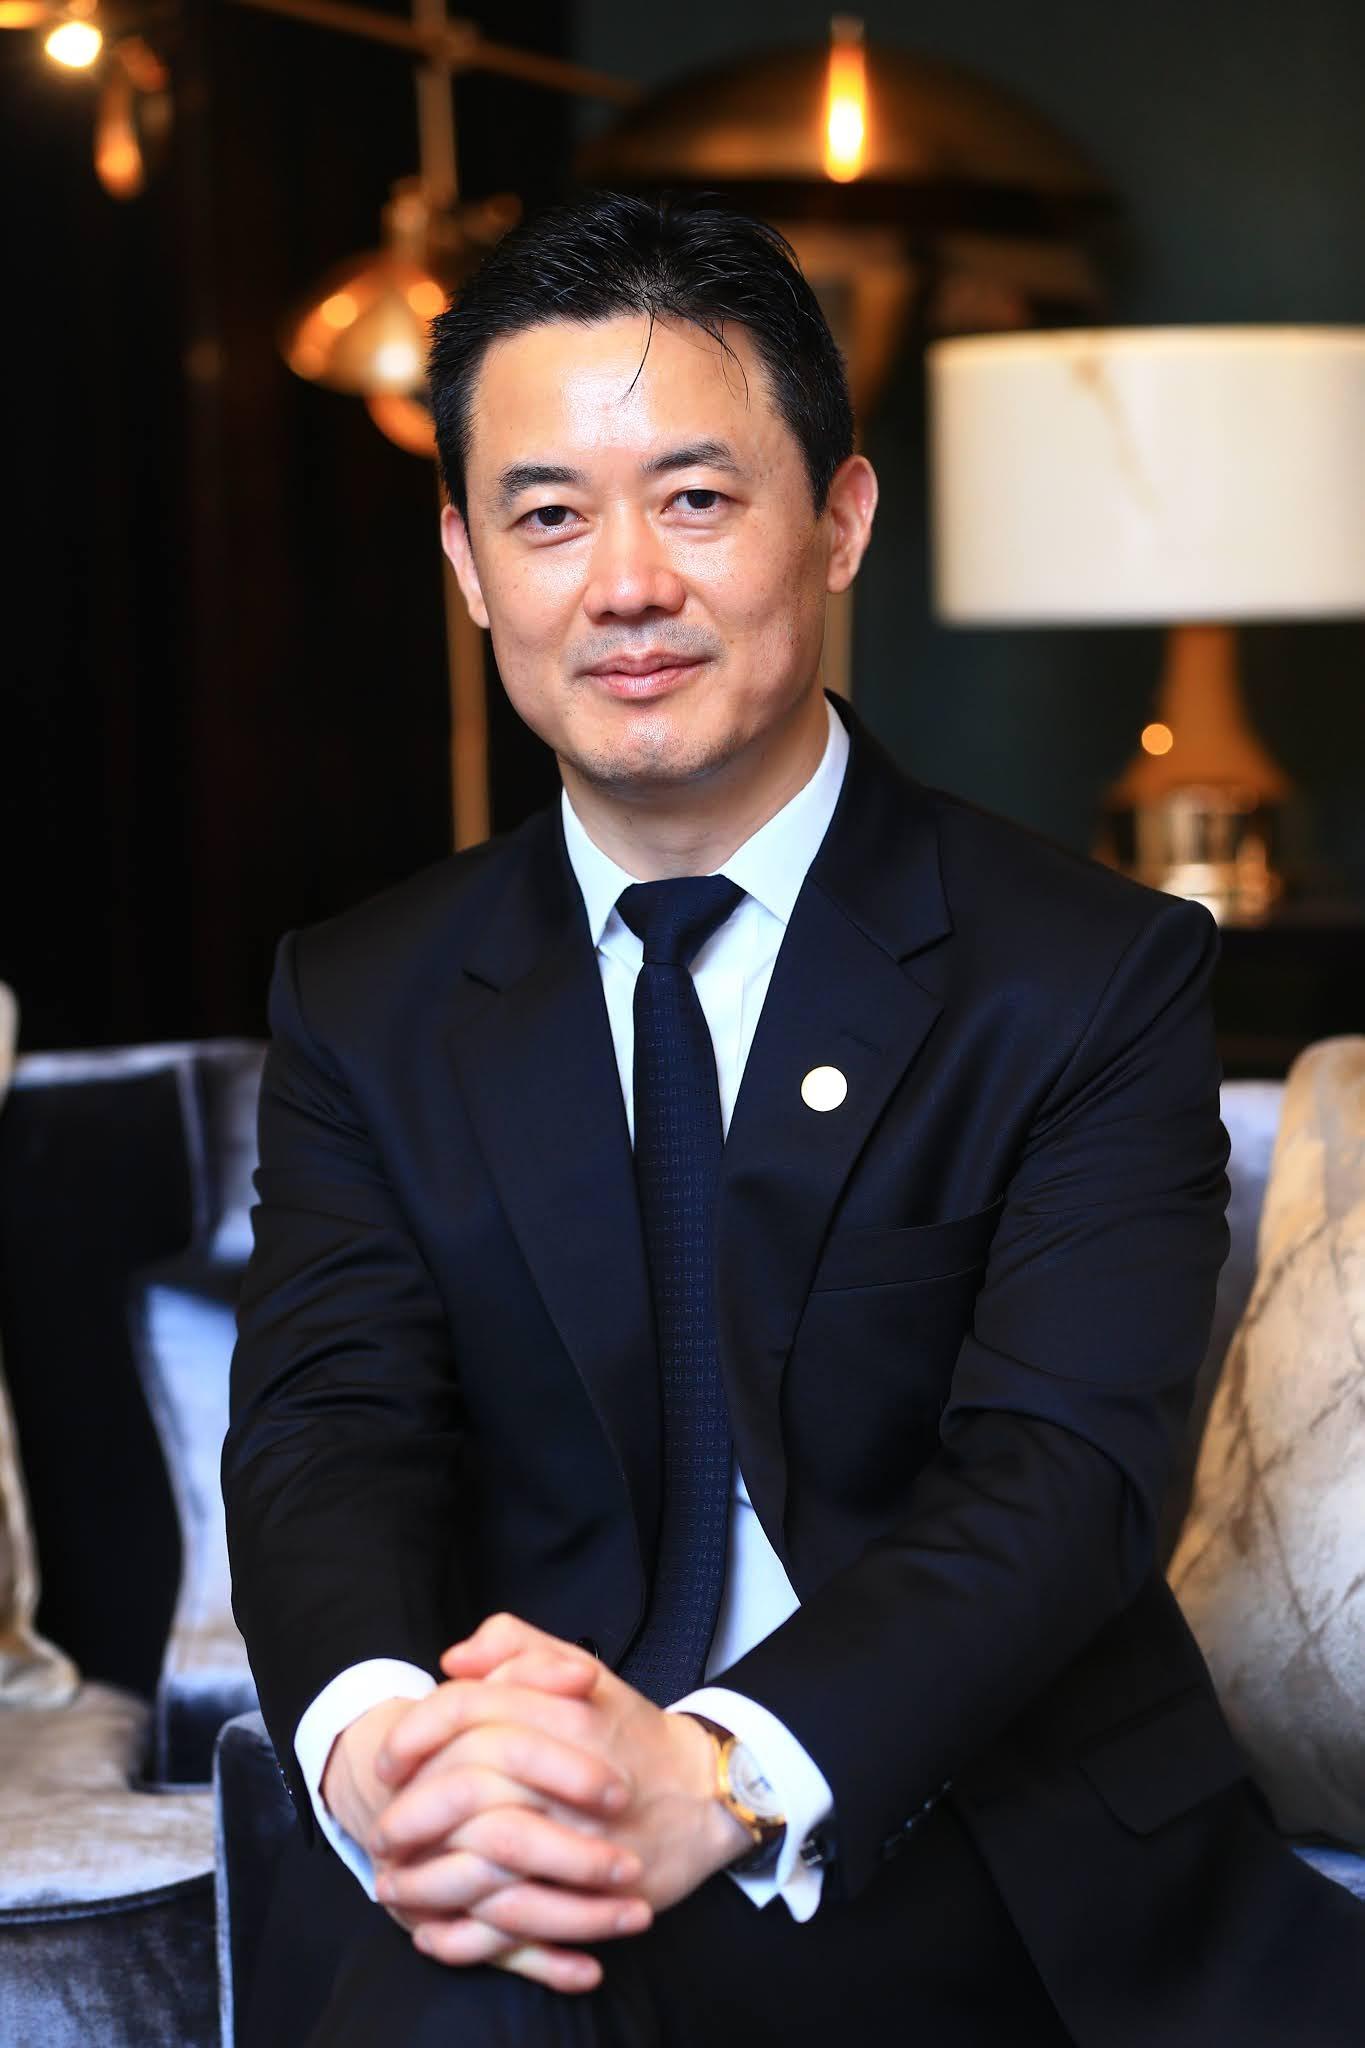 President of Huawei